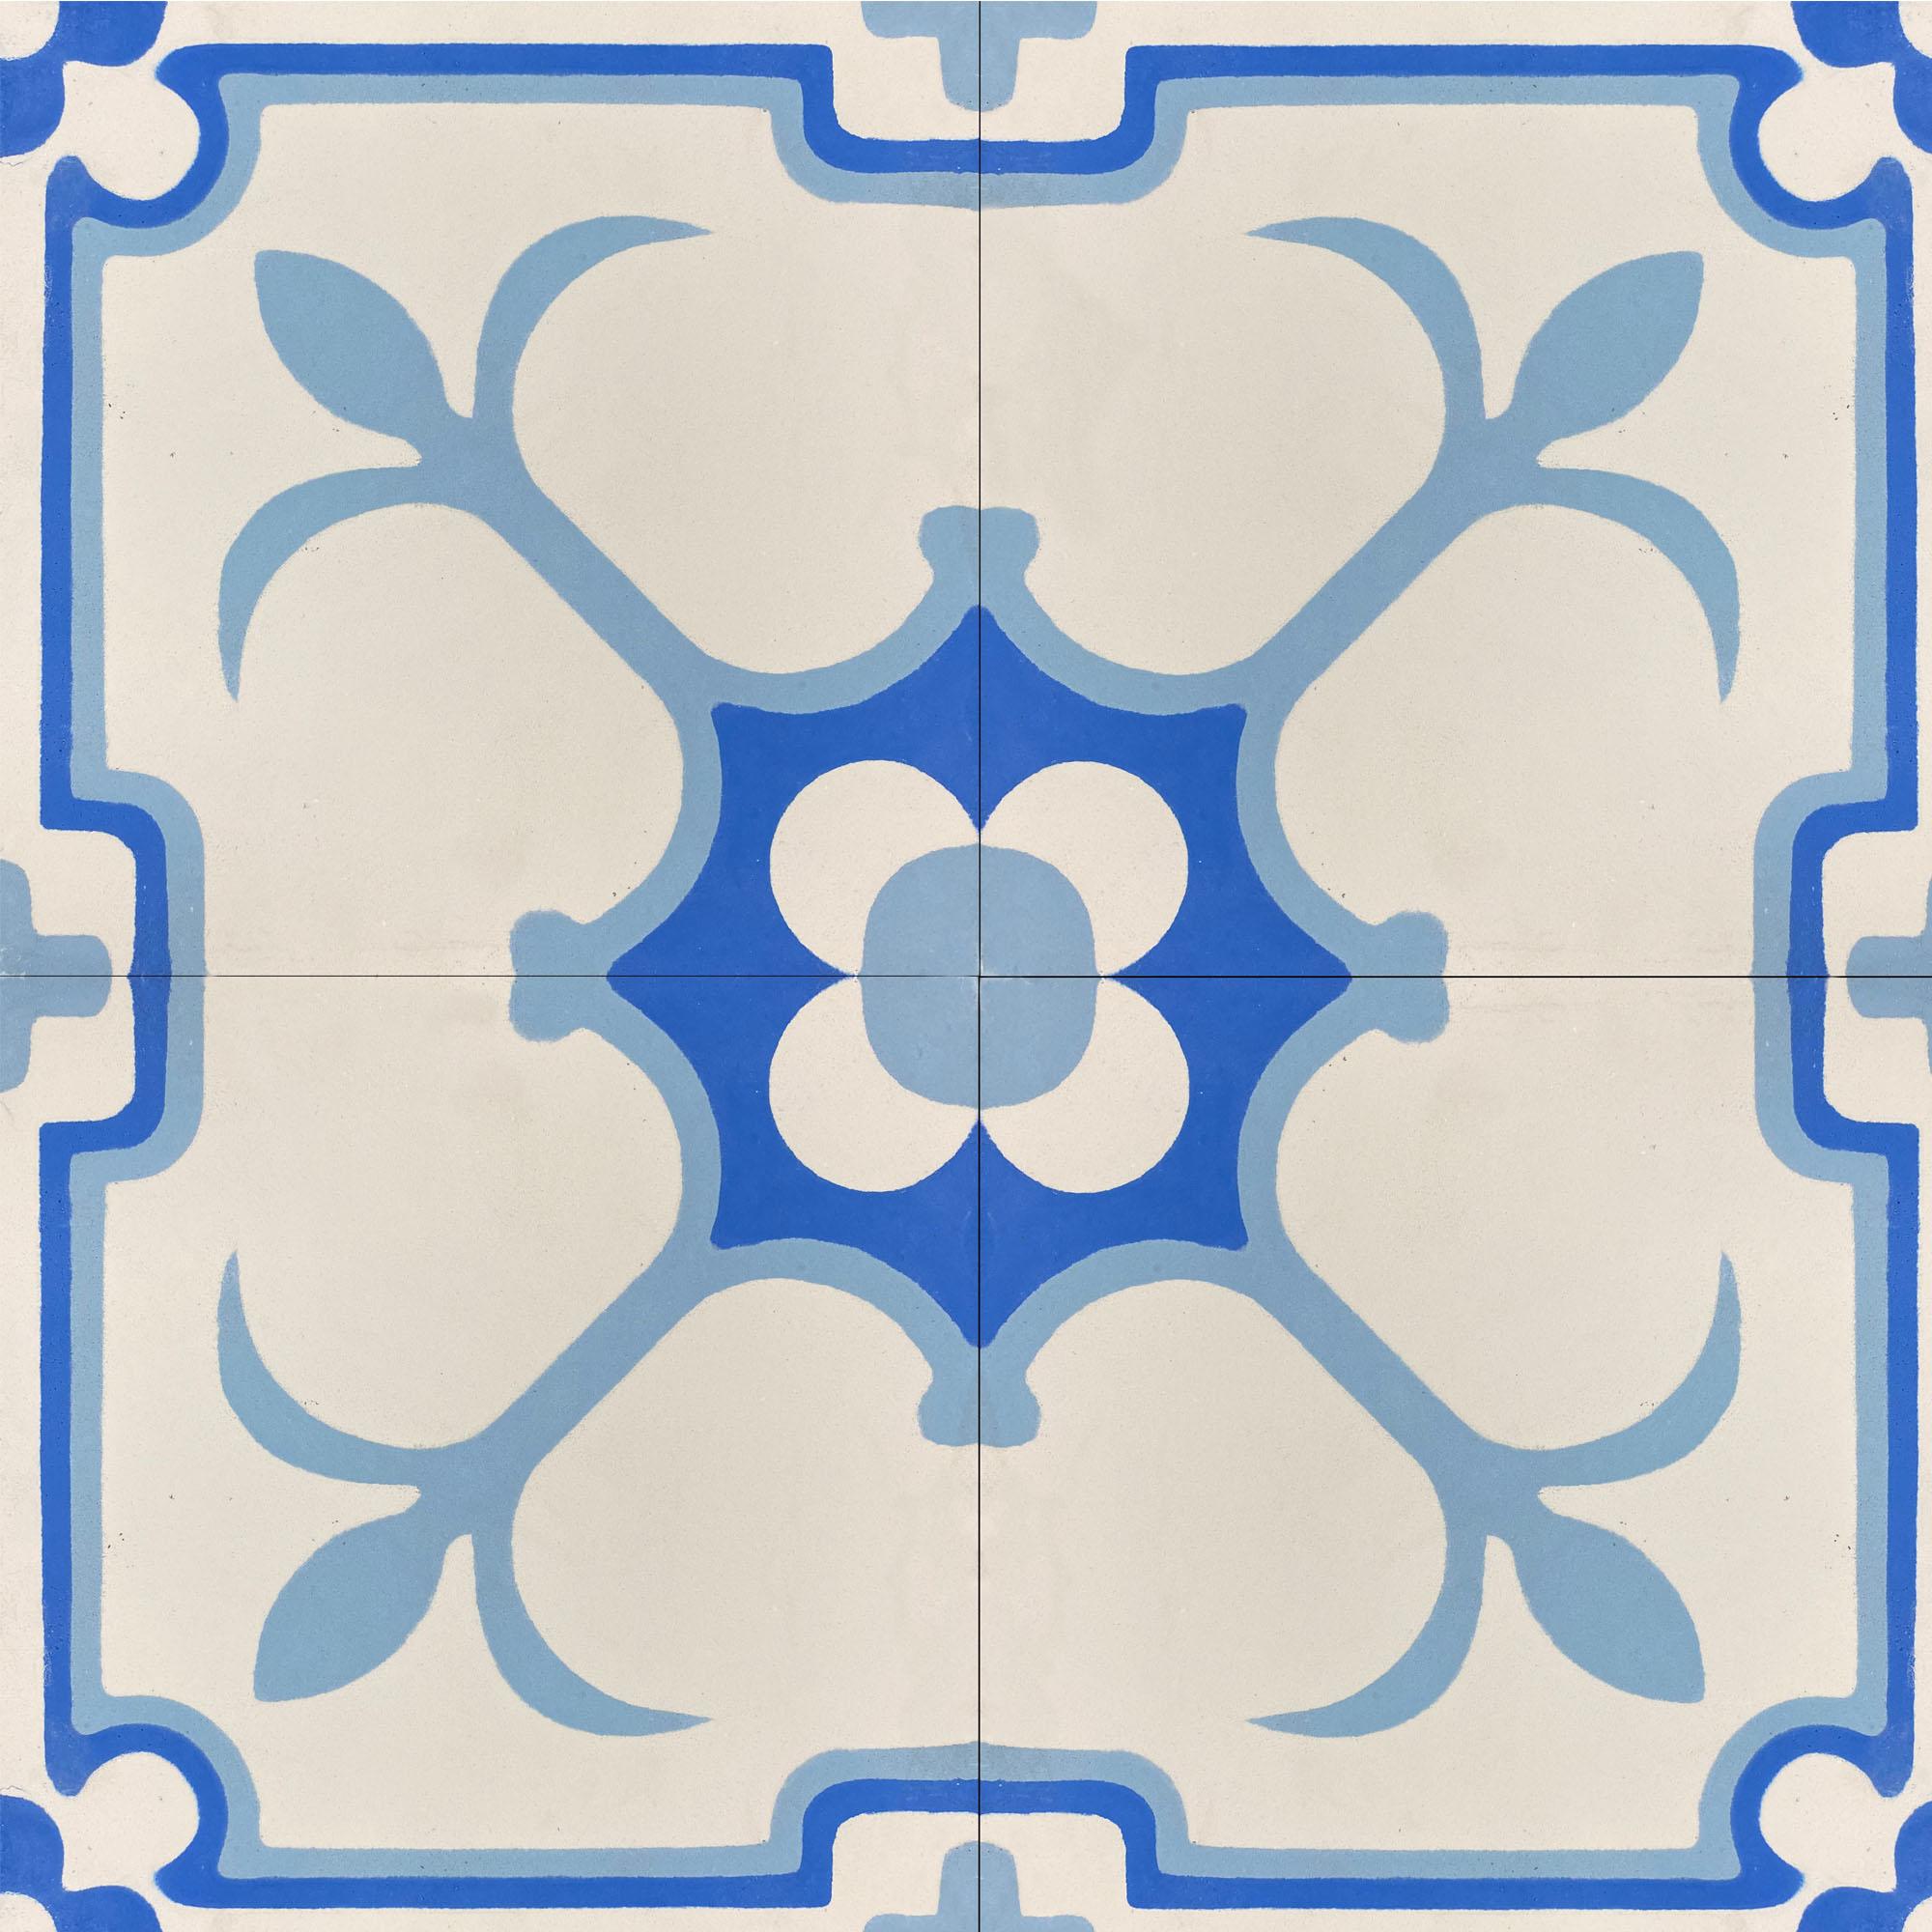 Koni Cement Tile KCT 09